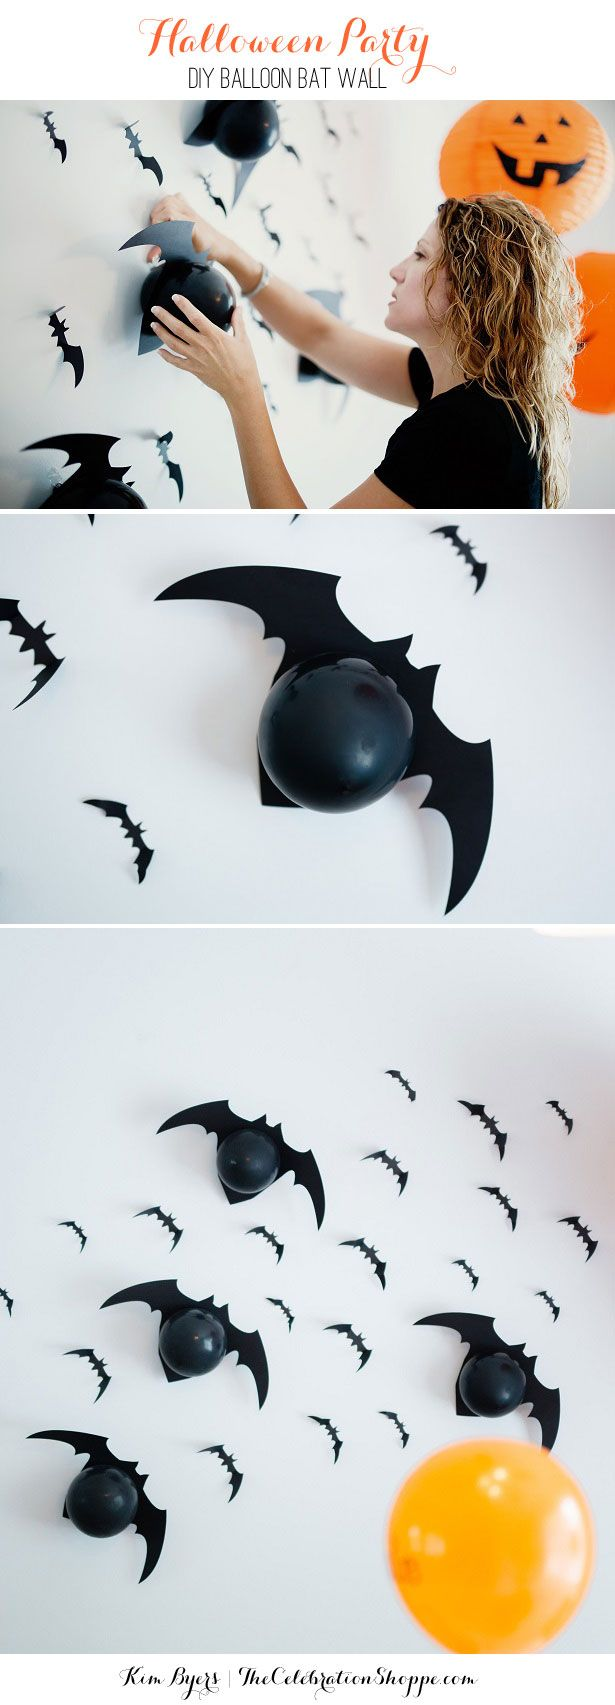 636 best images about Halloween on Pinterest | Halloween cookies ...